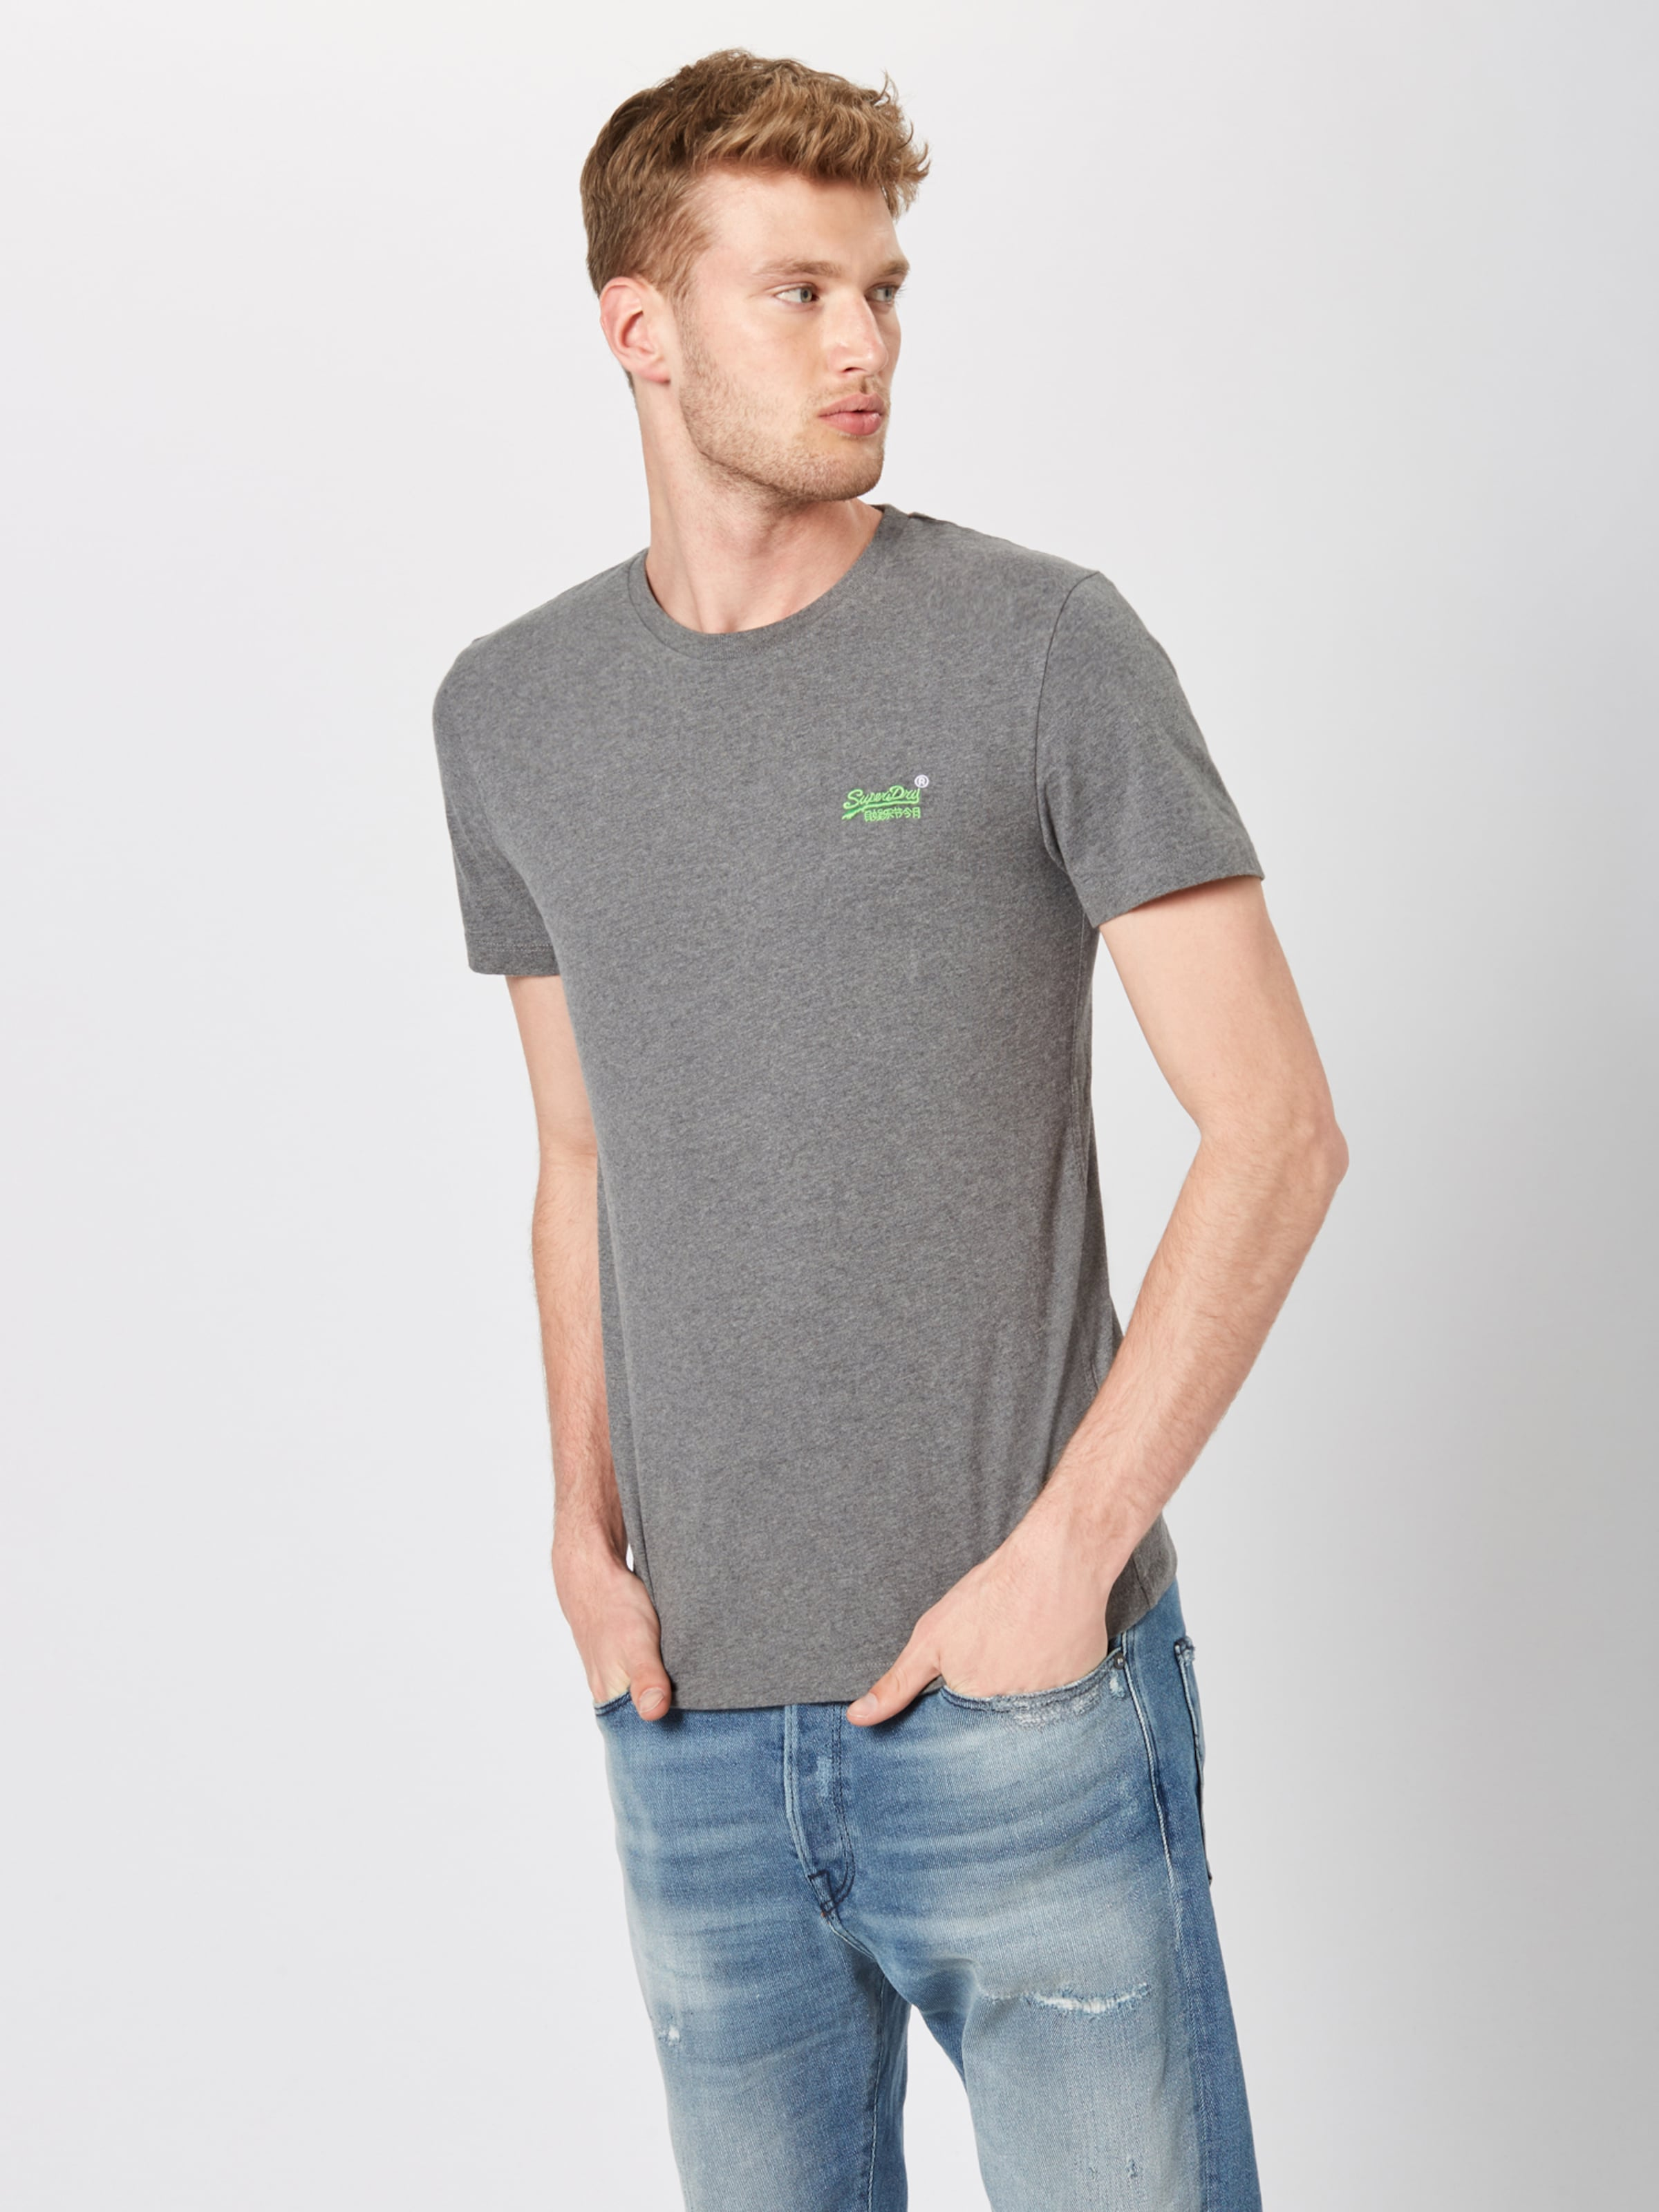 T Embroidery Bleu Superdry En Label Vintage 'orange shirt Tee' JcT1lFK3